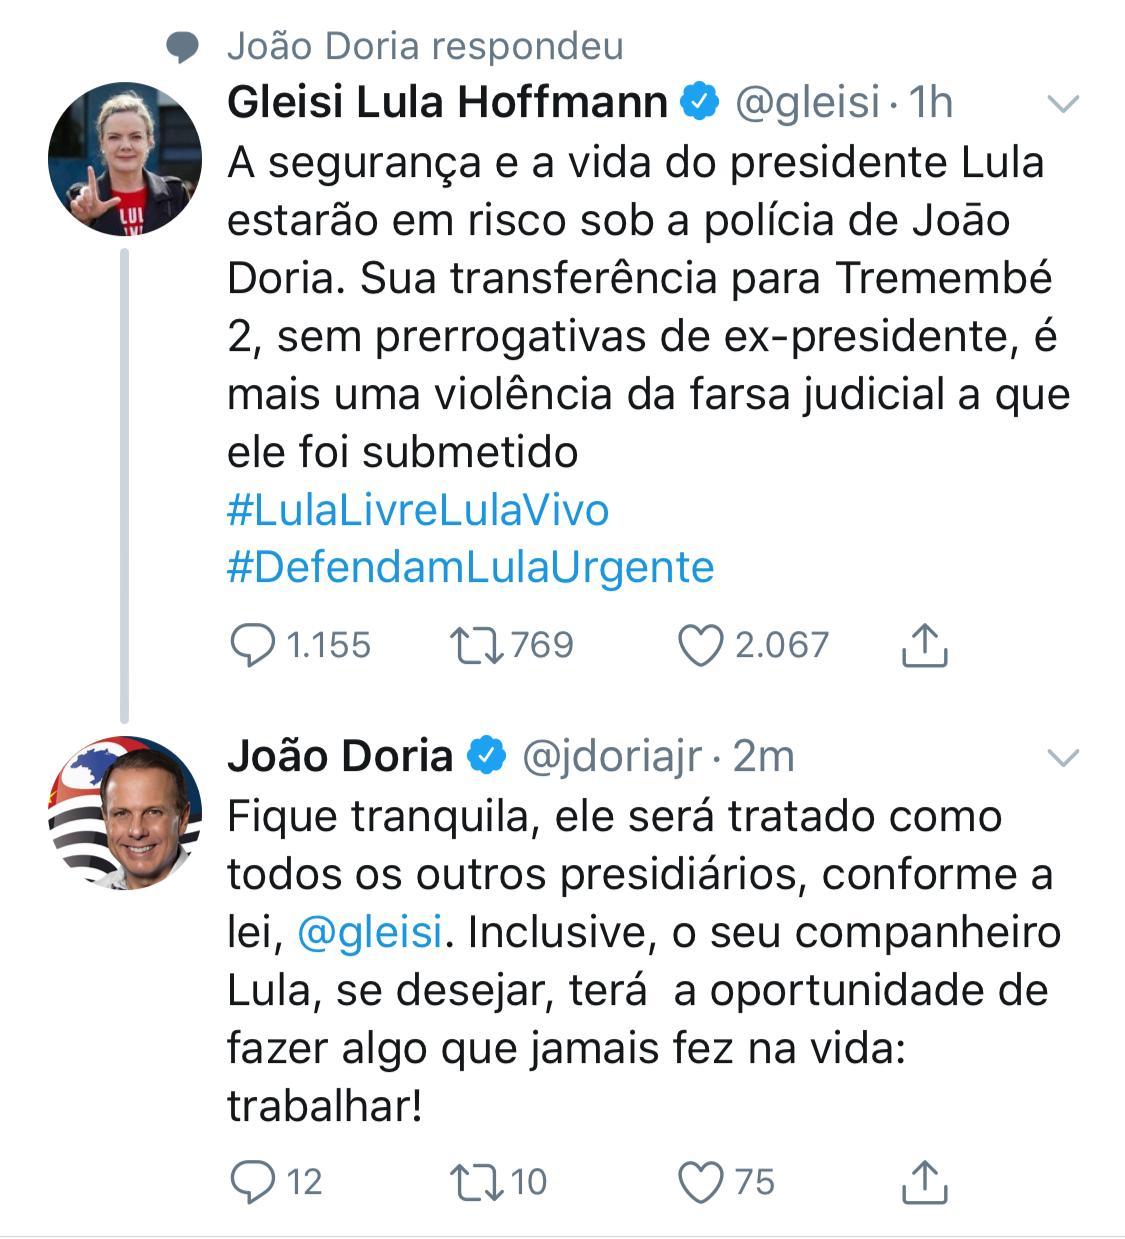 Gleosi Hoffman e Joao Doria